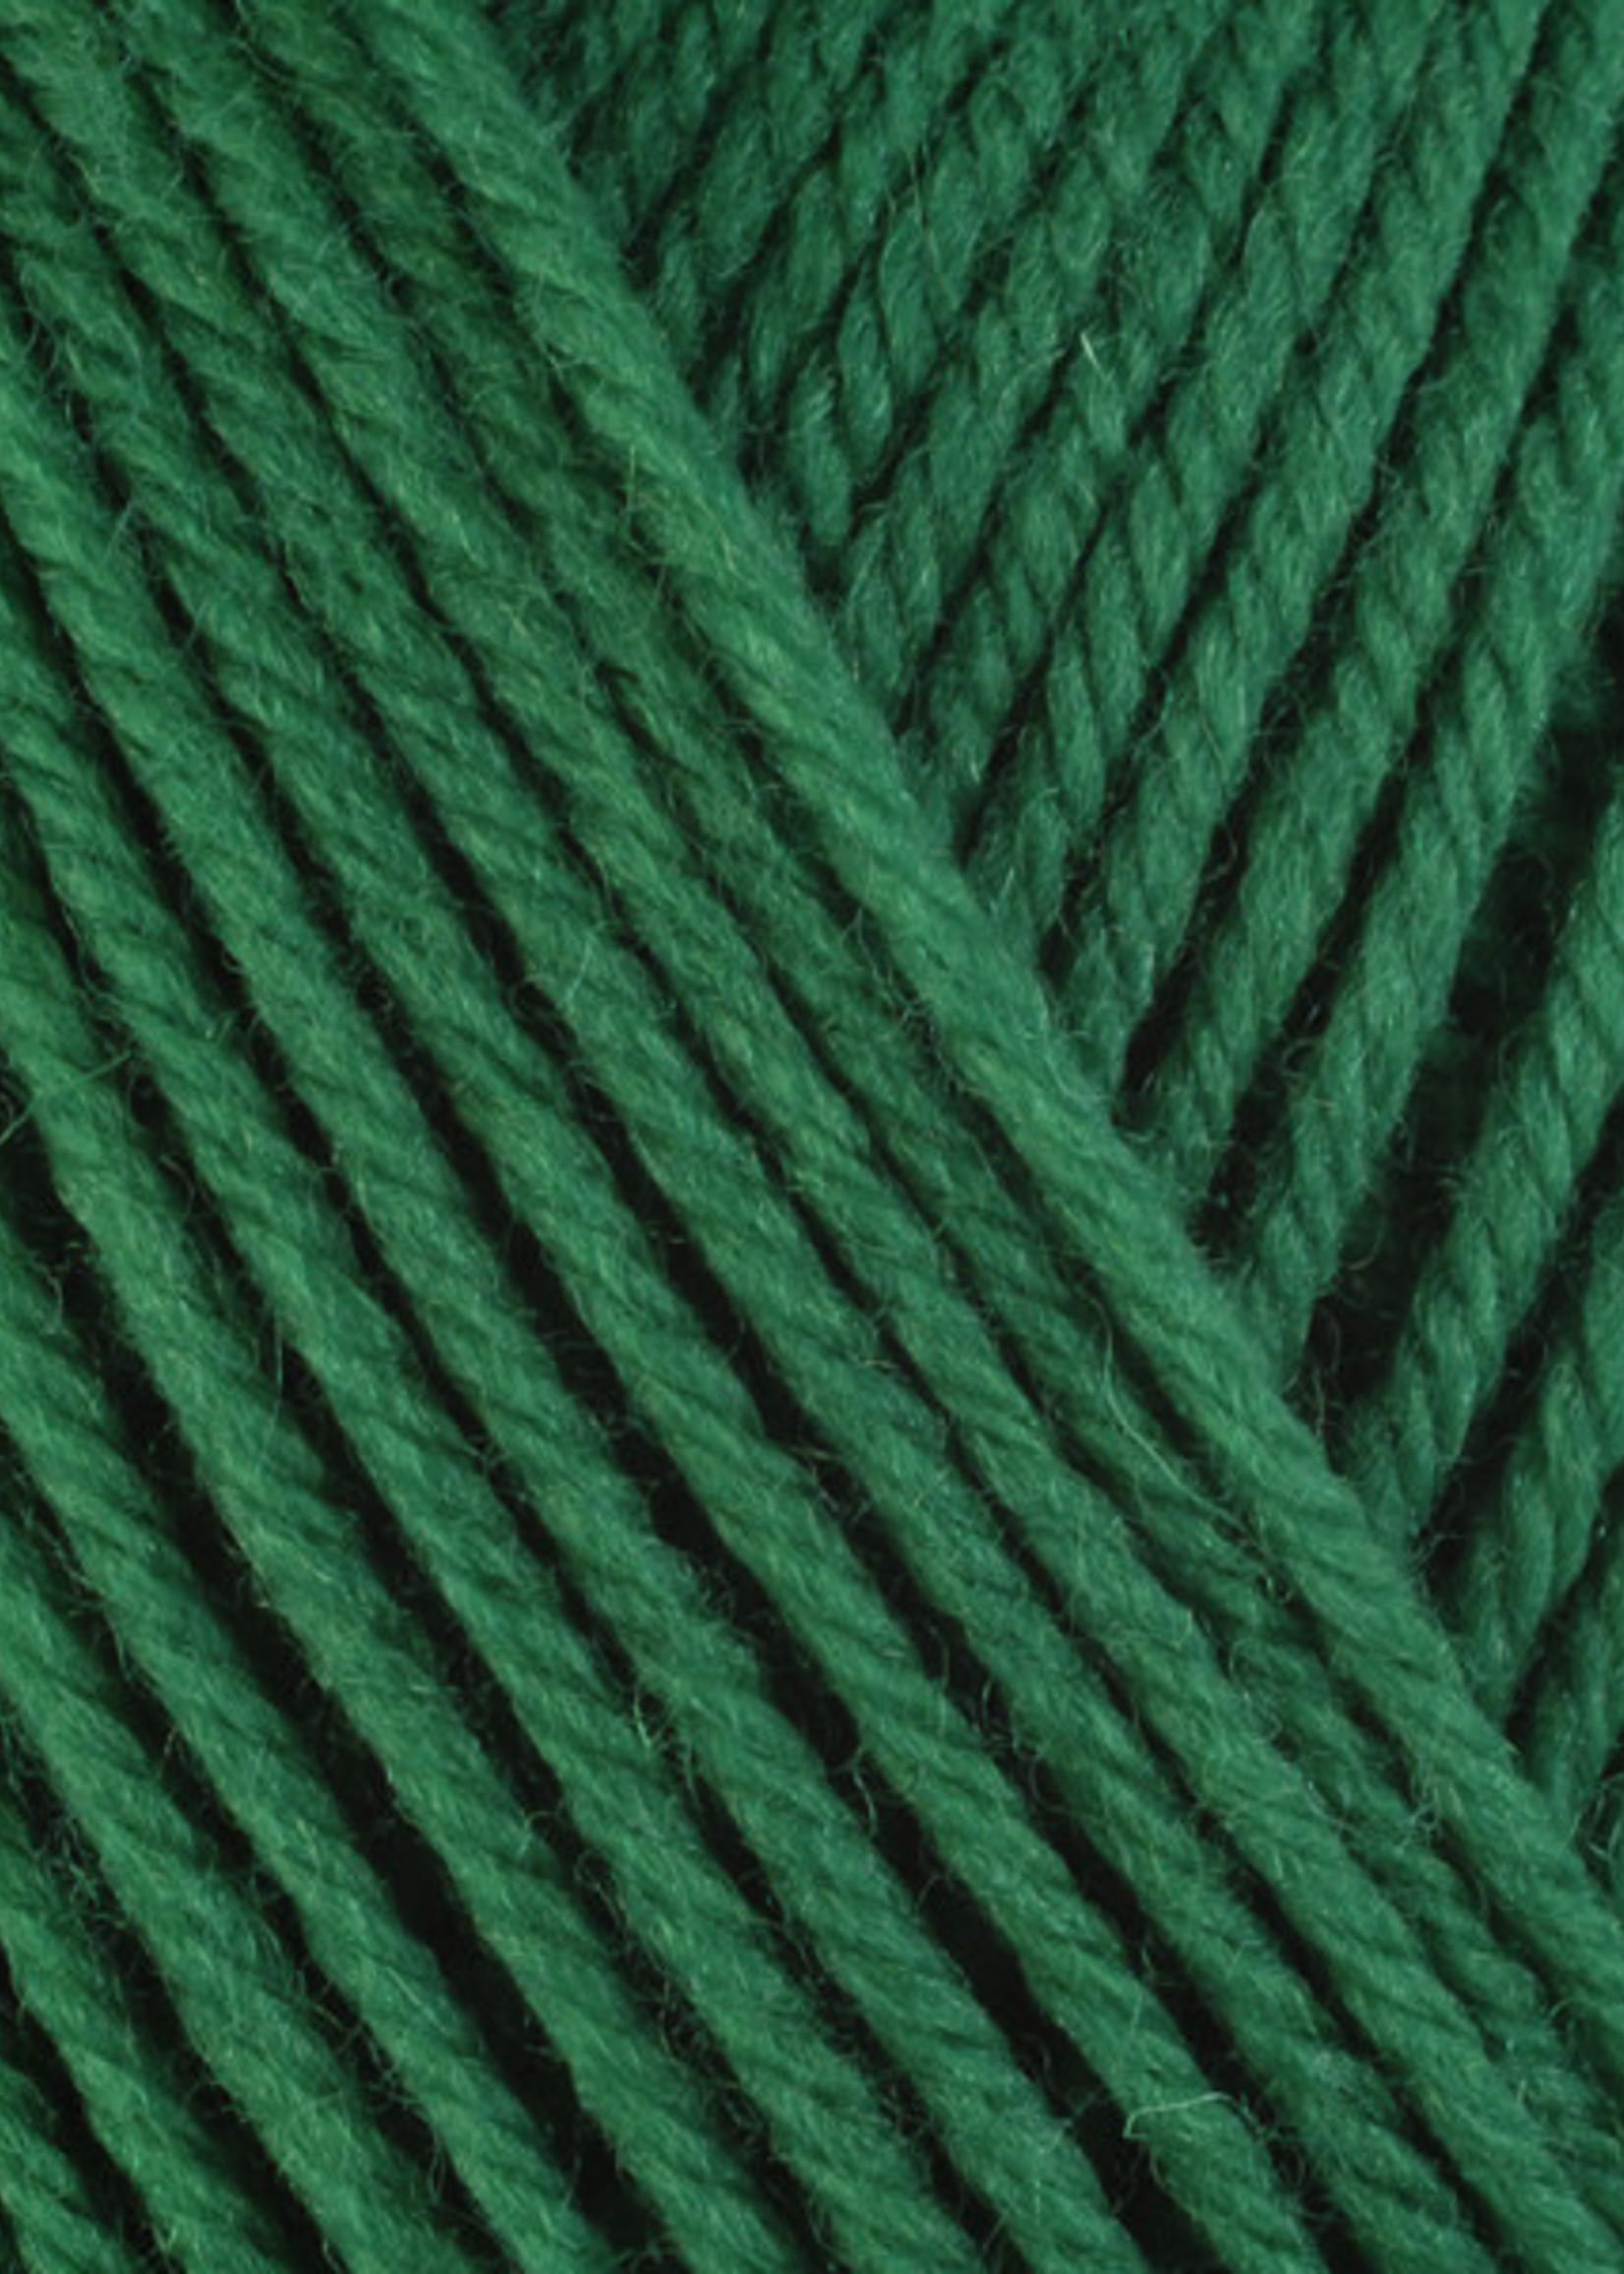 Berroco Berroco Ultra Wool 3335 Holly